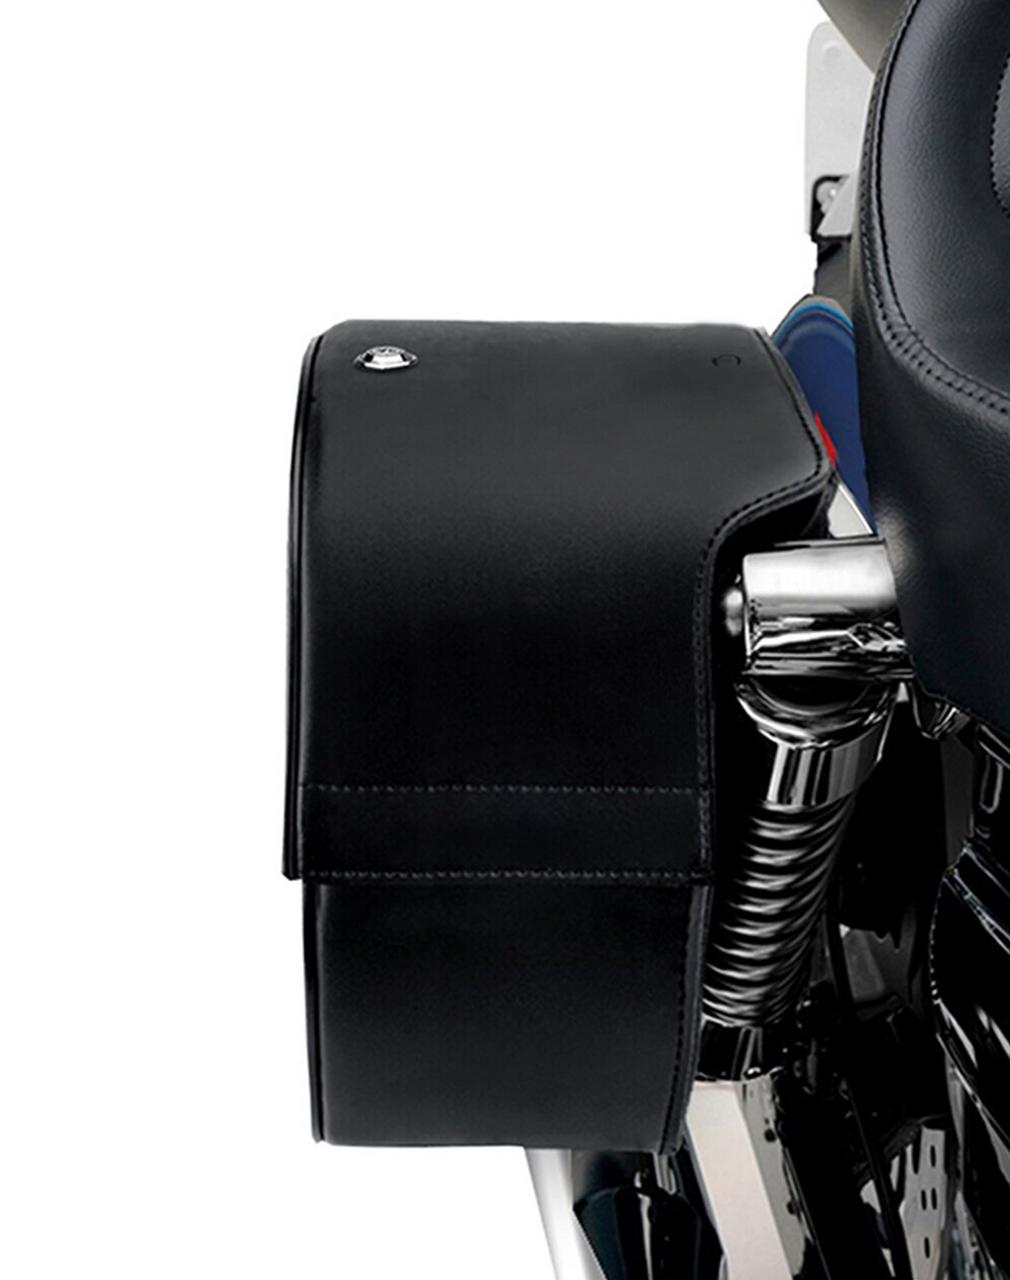 Honda VTX 1300 Retro Large SS Shock Cutout Slanted Studded Motorcycle Saddlebags Shock Cutout View